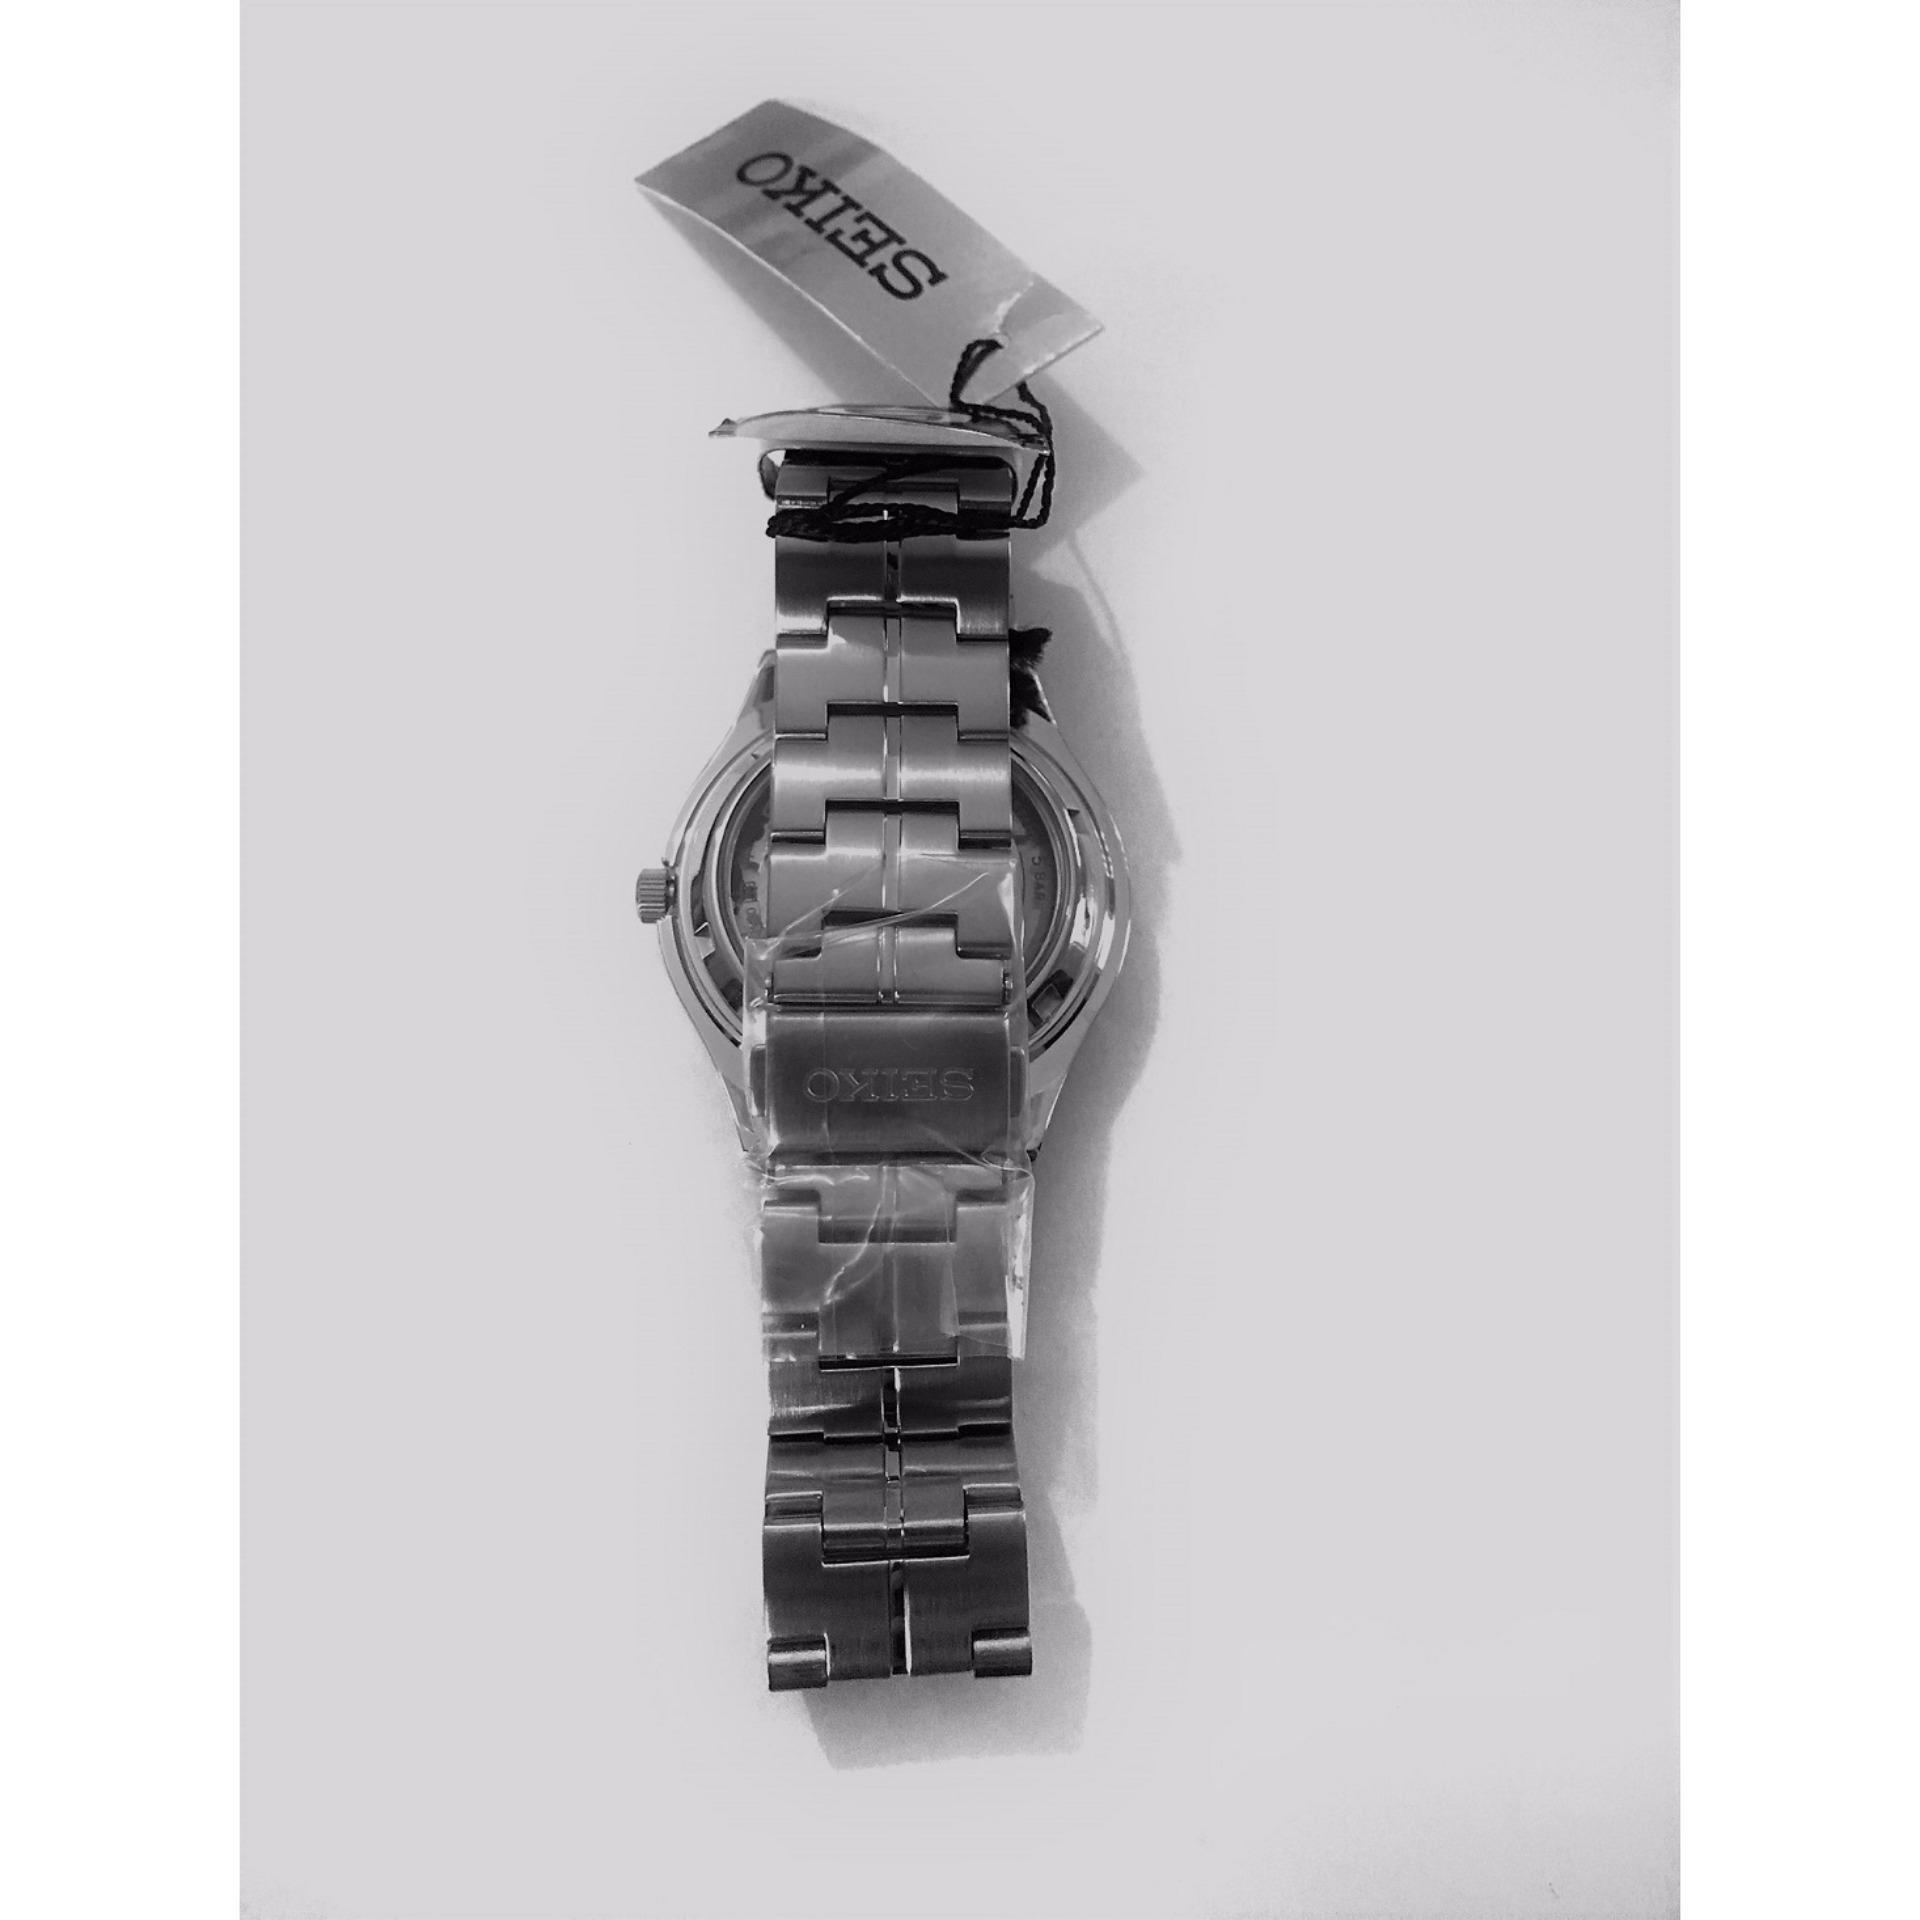 Jam Tangan Seiko Snk347 Strap Stainless Steel Silver Daftar Harga Chronograph Sks521p1